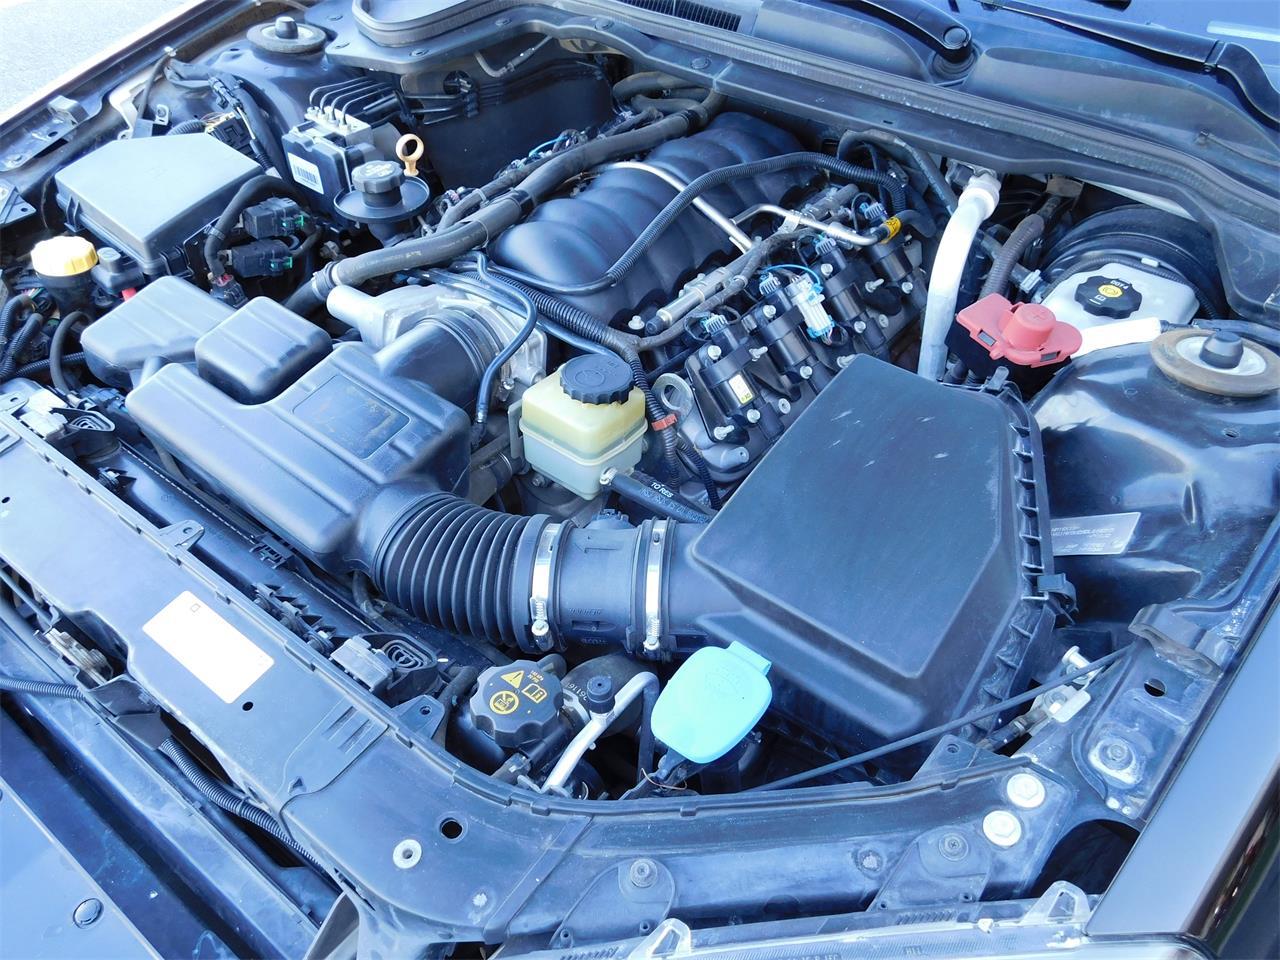 2013 Chevrolet Caprice Ppv For Sale Classiccars Com Cc 928732